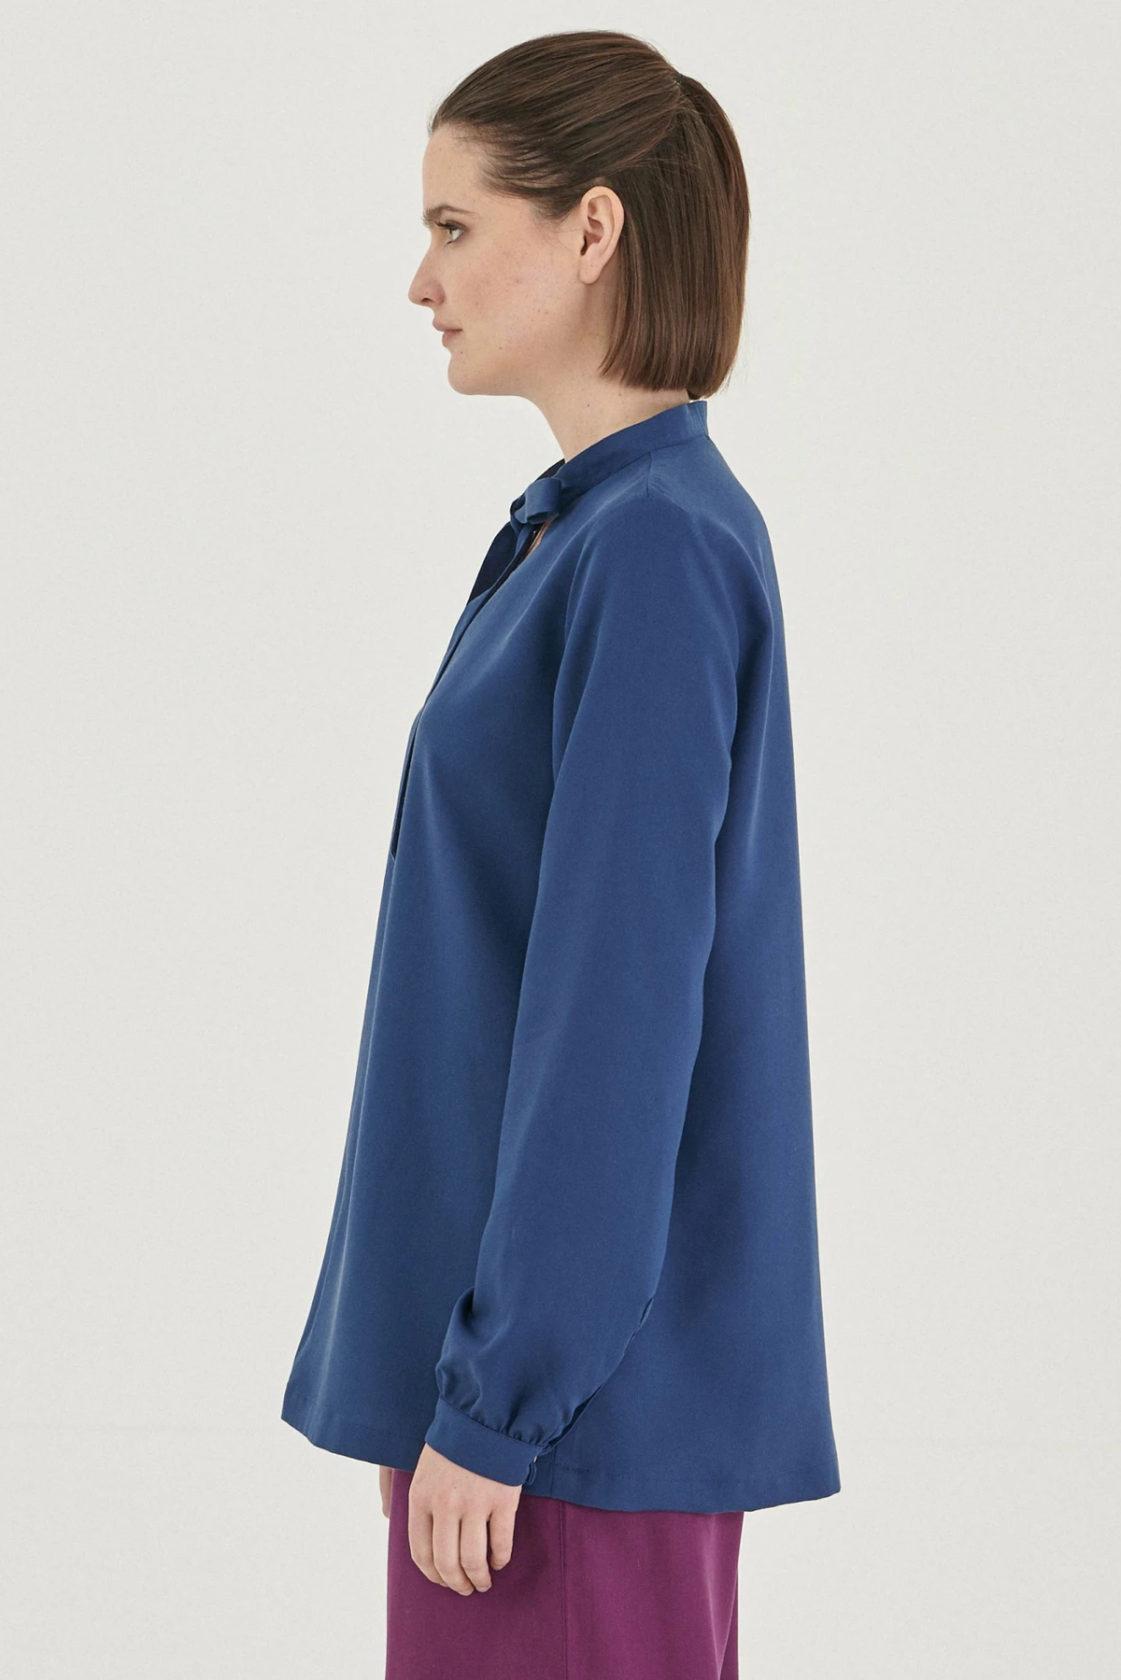 Roberta Organic Fashion Organication Bluse Blau 2